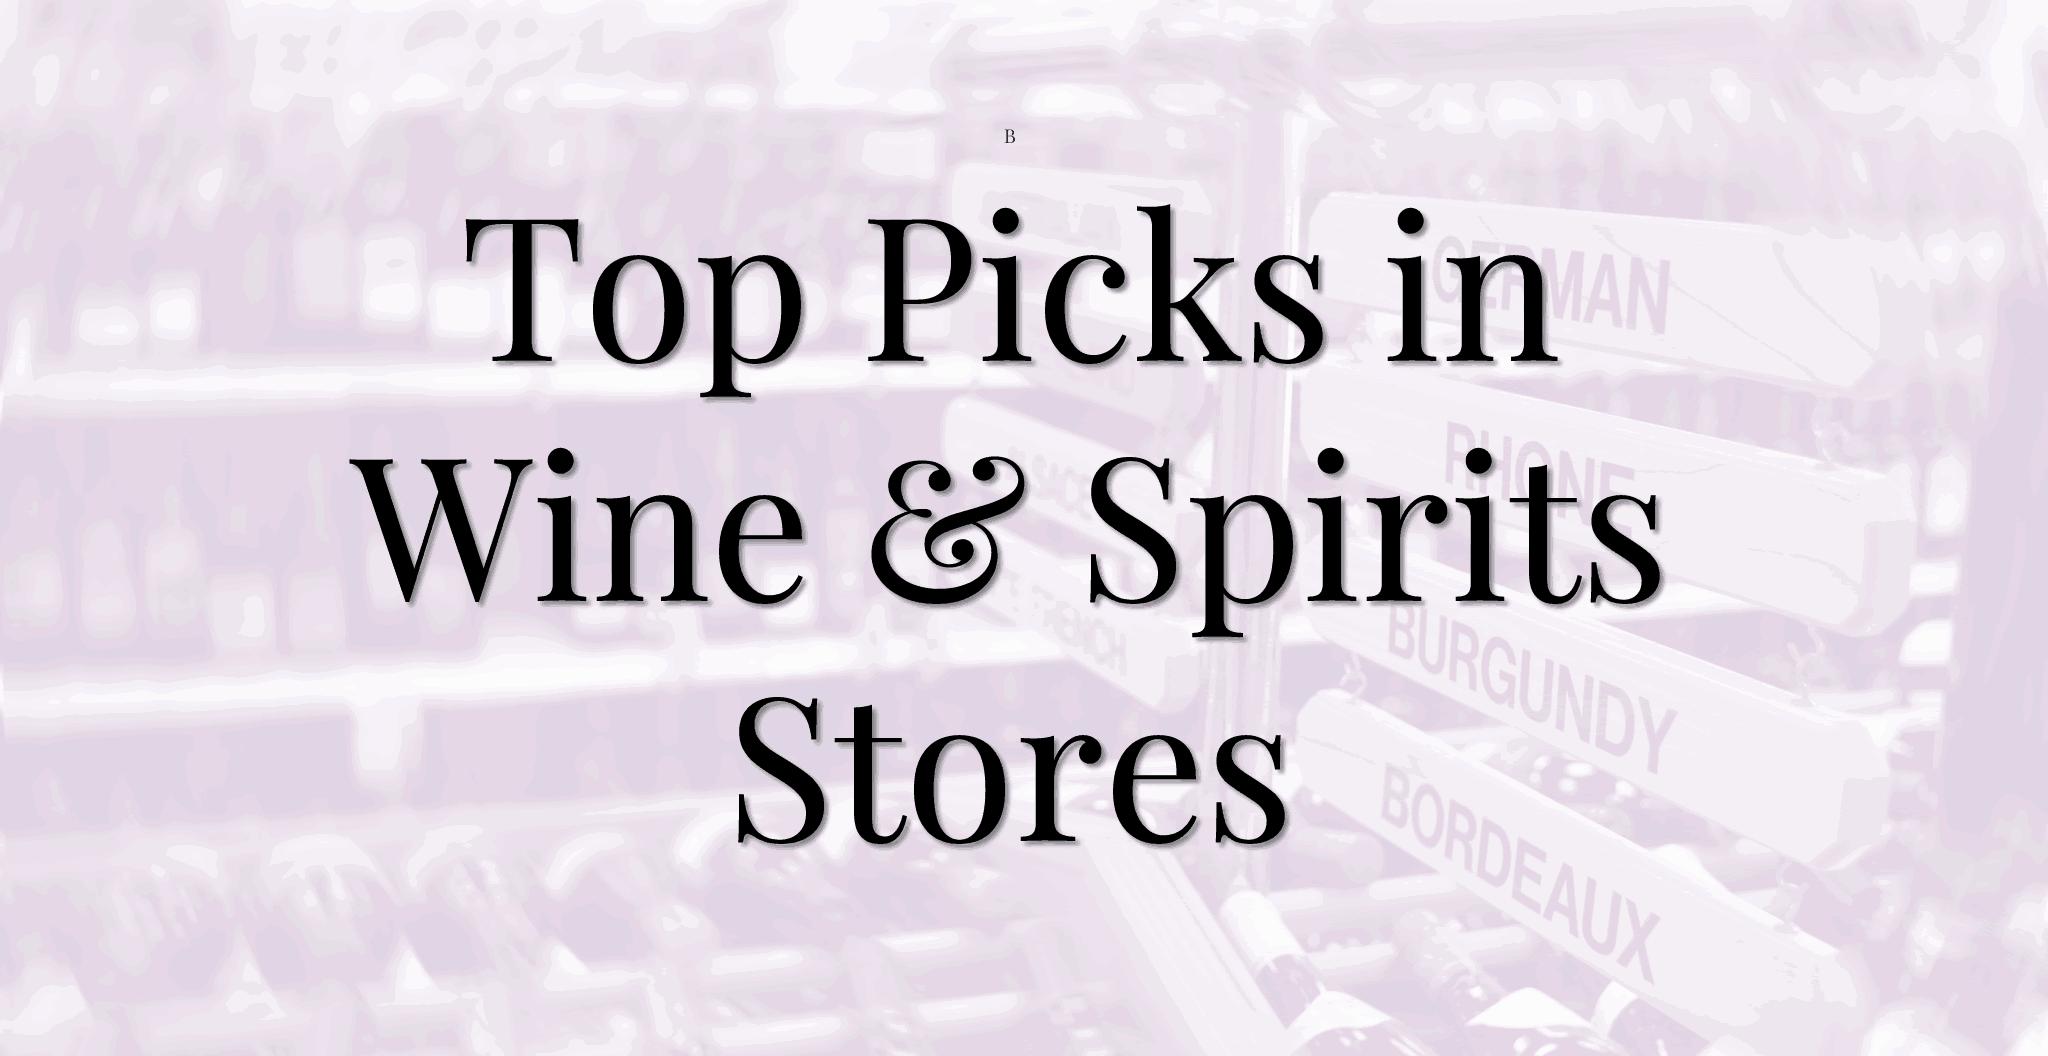 Wine & Spirits Stores